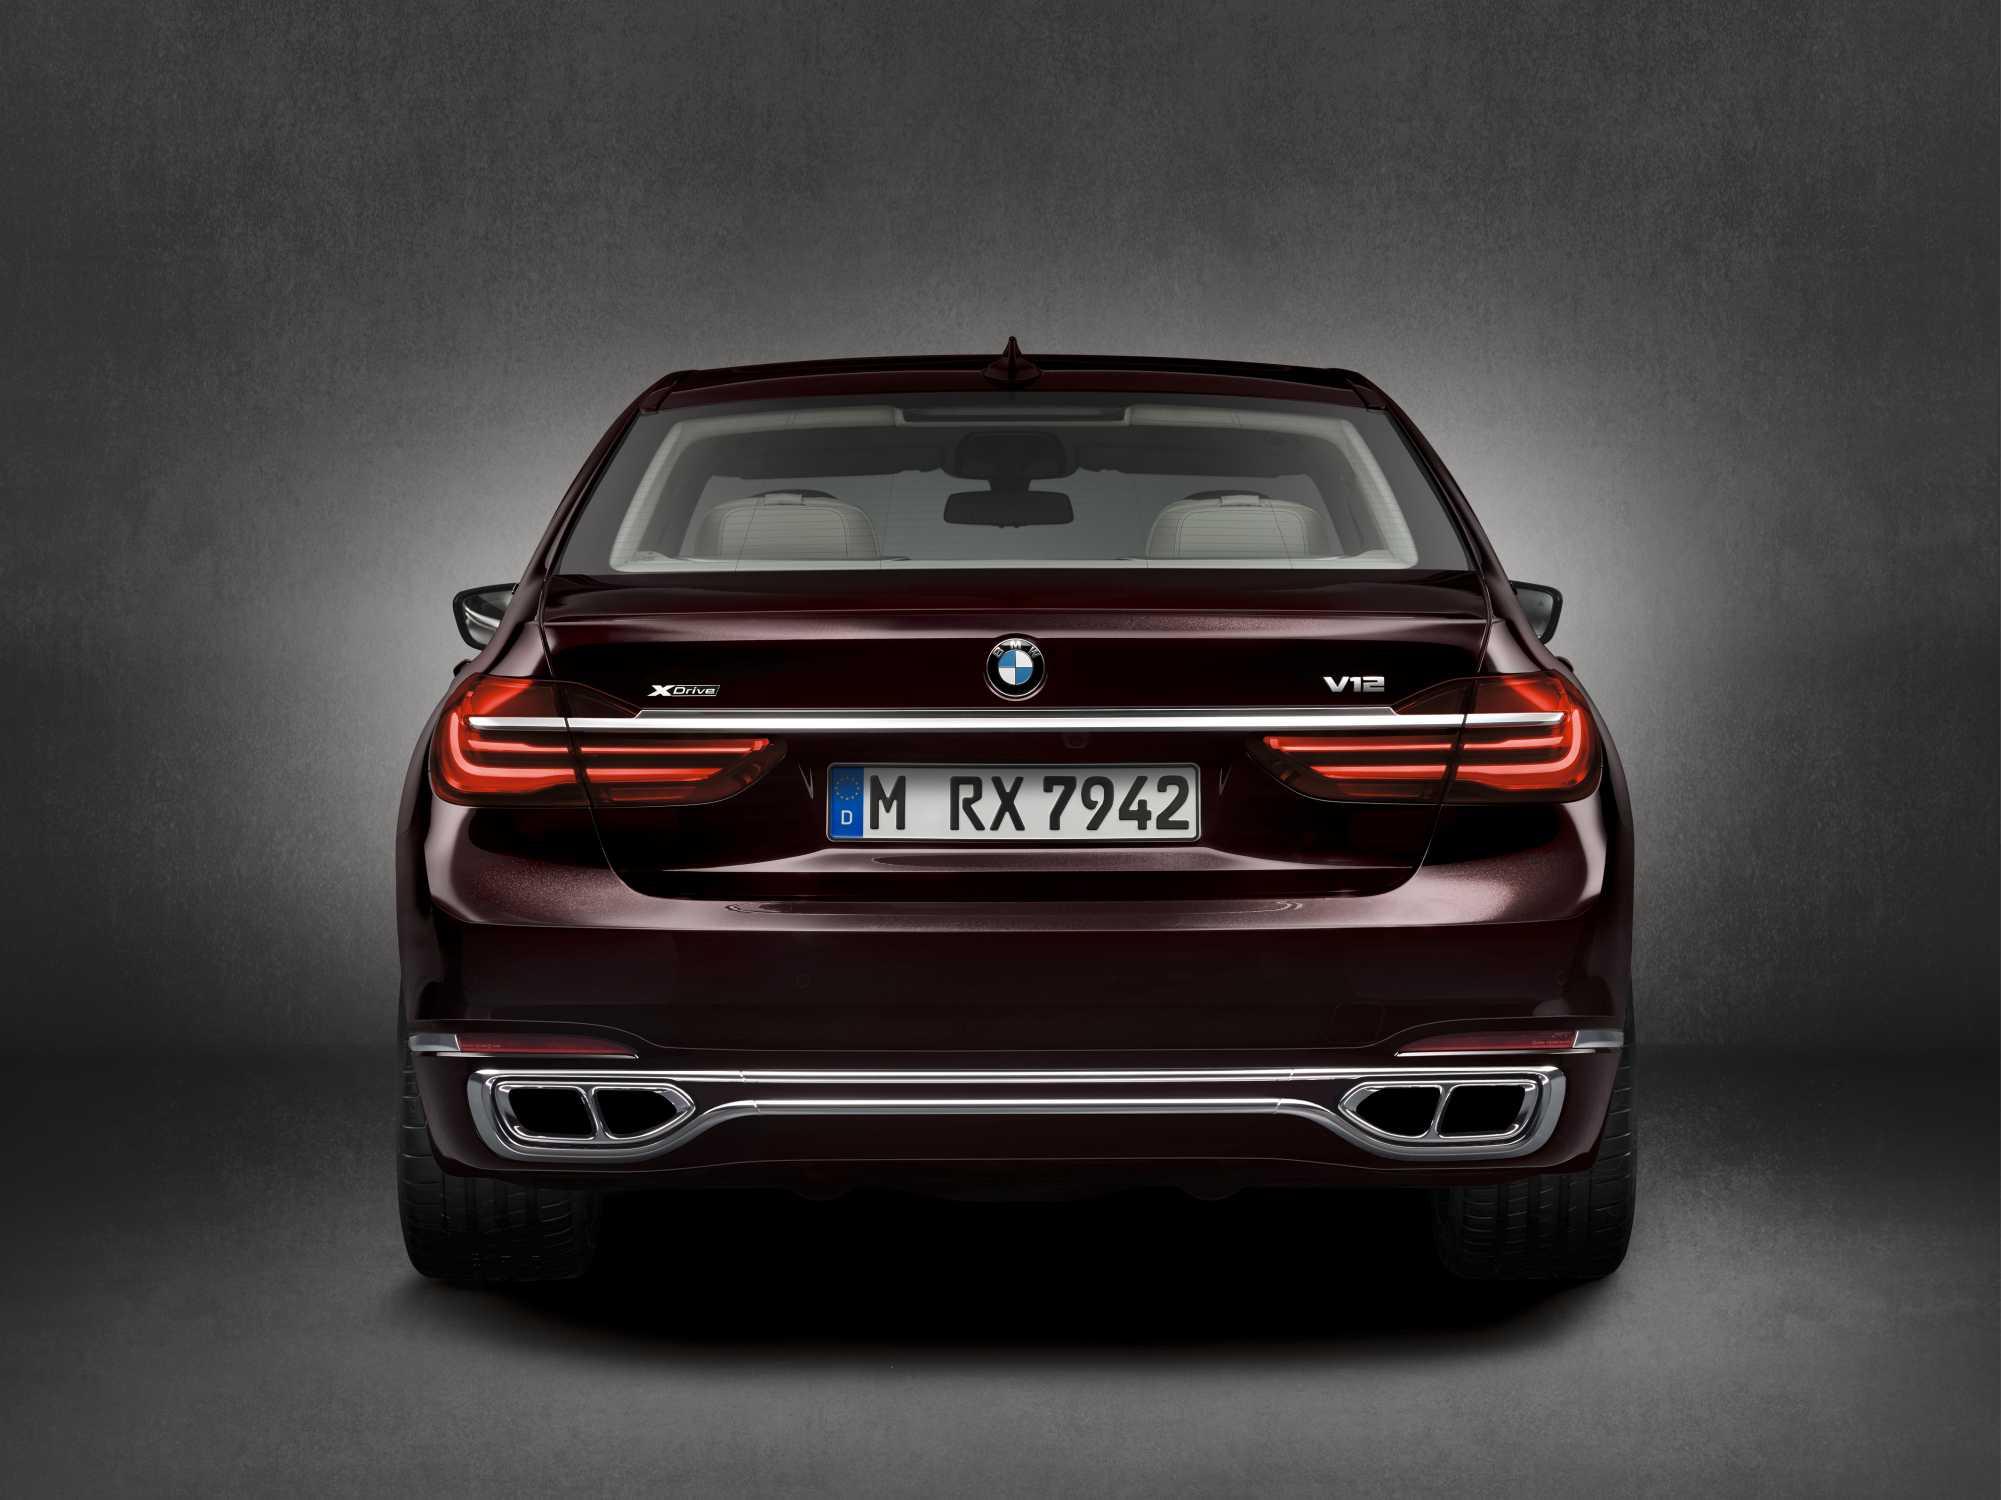 BMW M760Li XDrive Model V12 Excellence